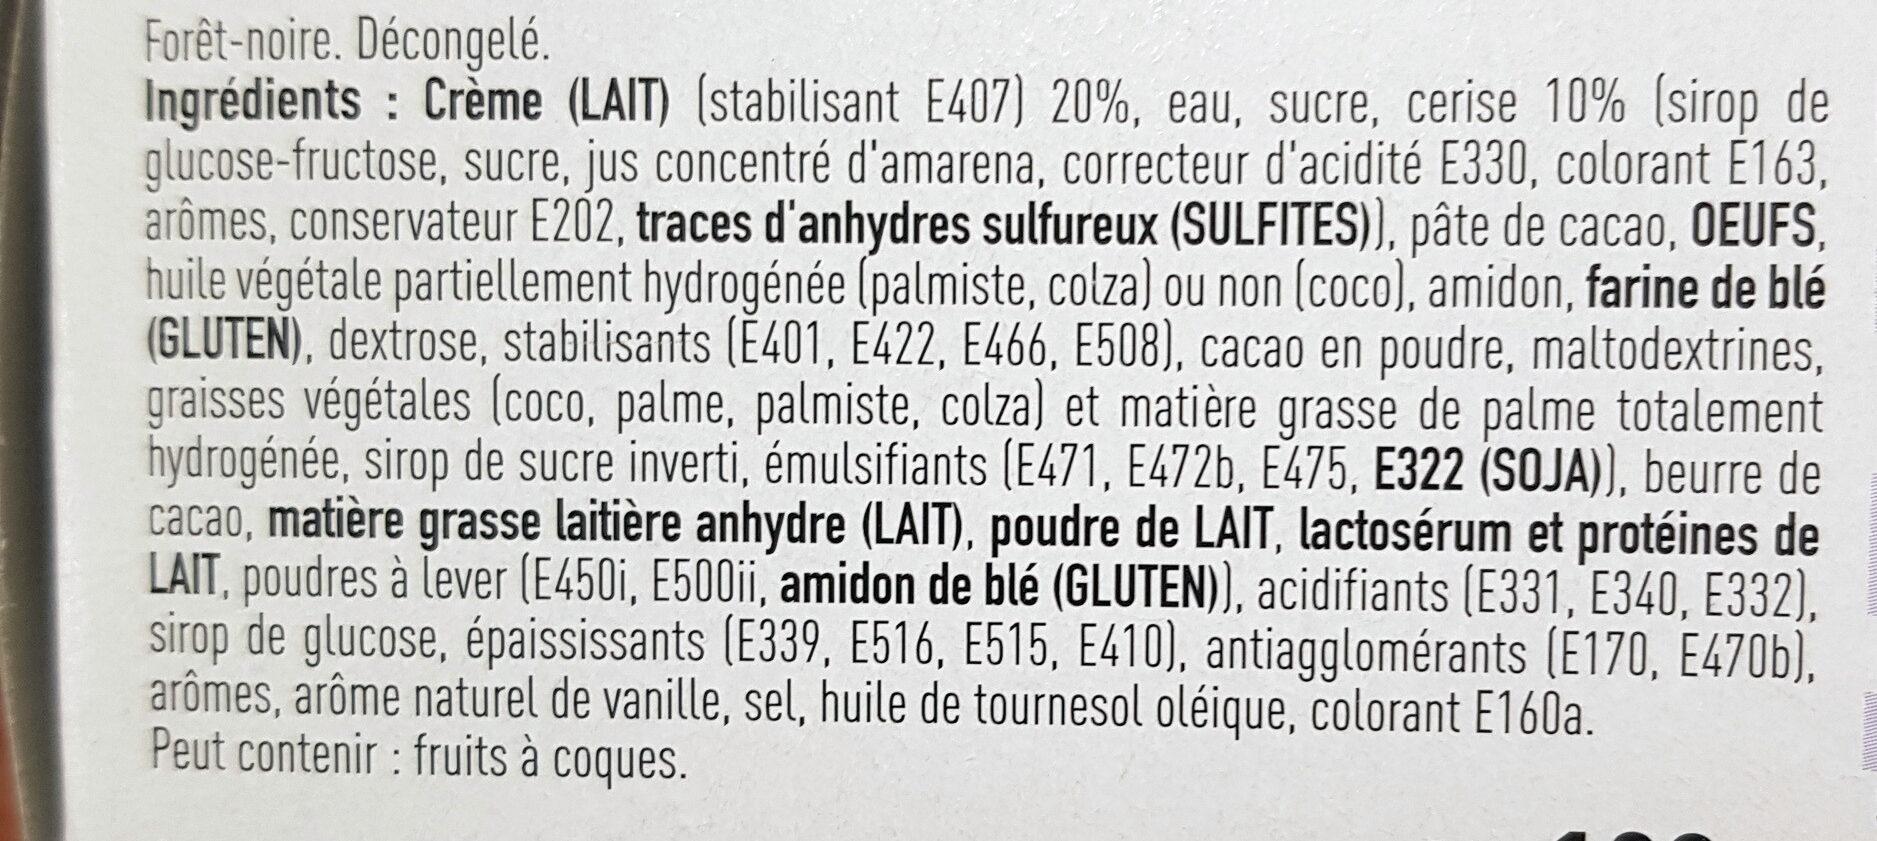 Foret noire Patiprestige x2 - Ingredients